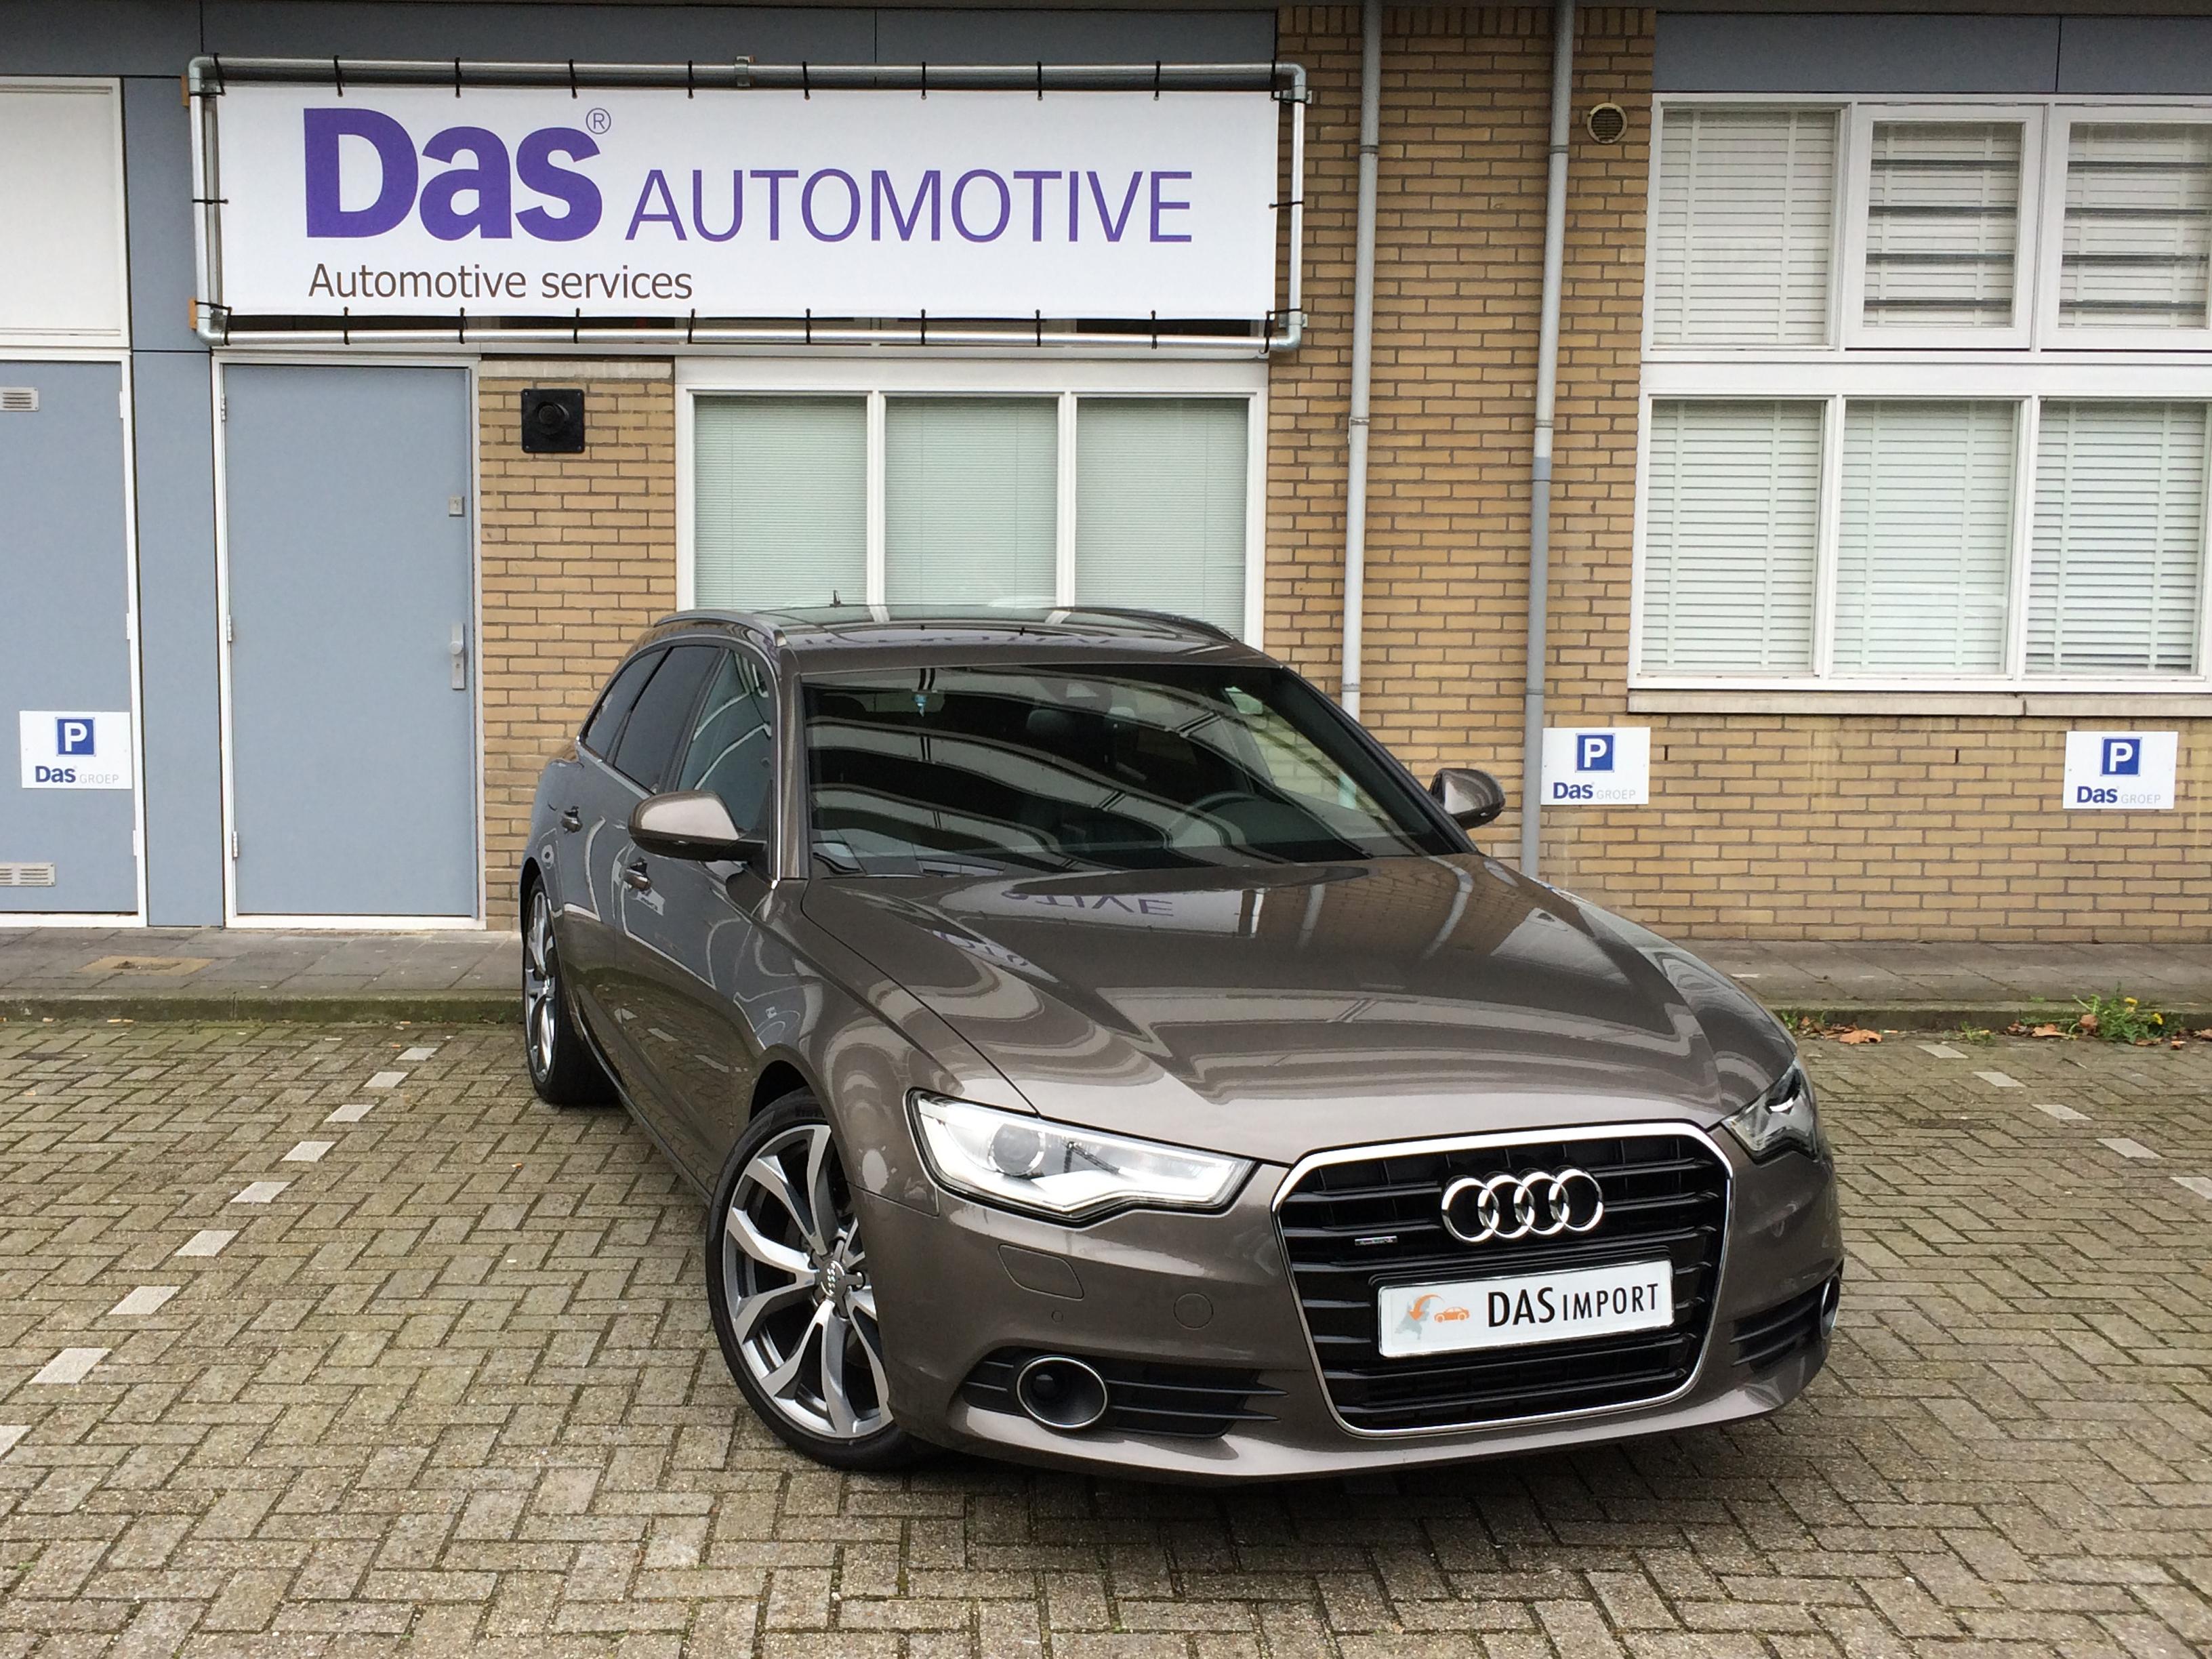 Importauto: Audi A6 Avant Diesel 3.0 TDI 180kW quattro S tronic 12/2012